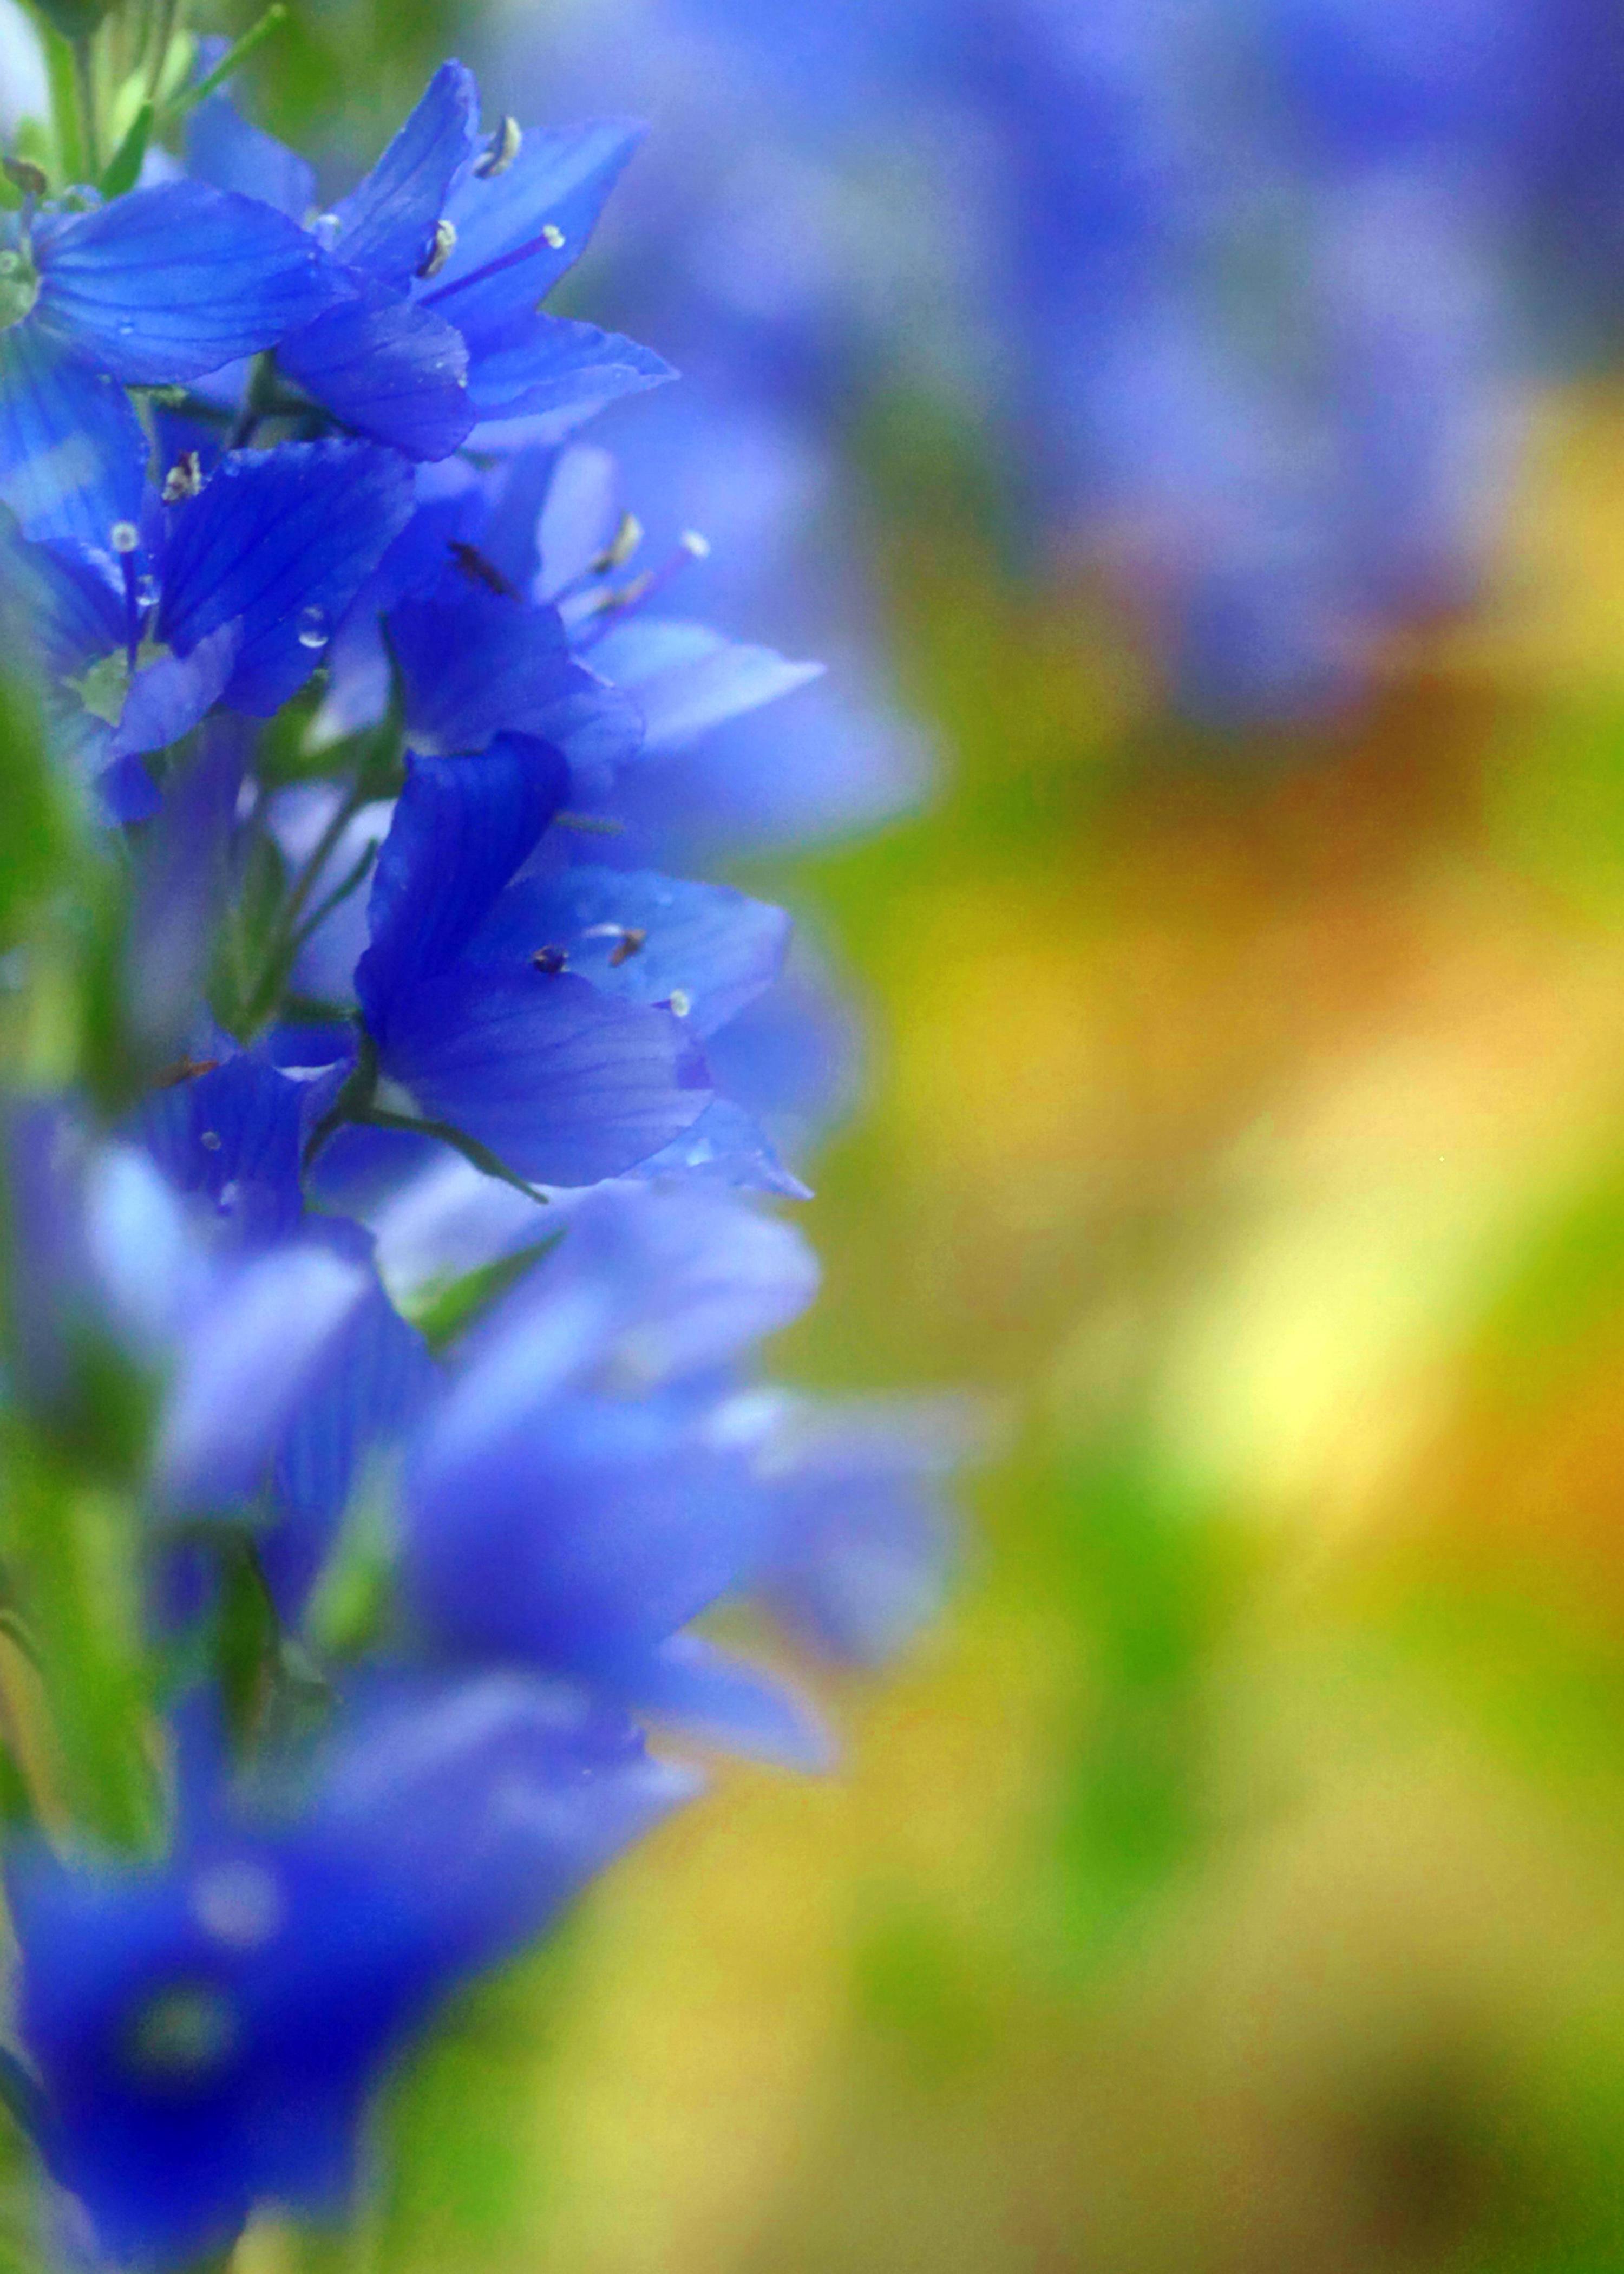 Blurrd Blue Flowers, Summerflowers, Flowerprint, Springsflowers, Poster, HQ Photo